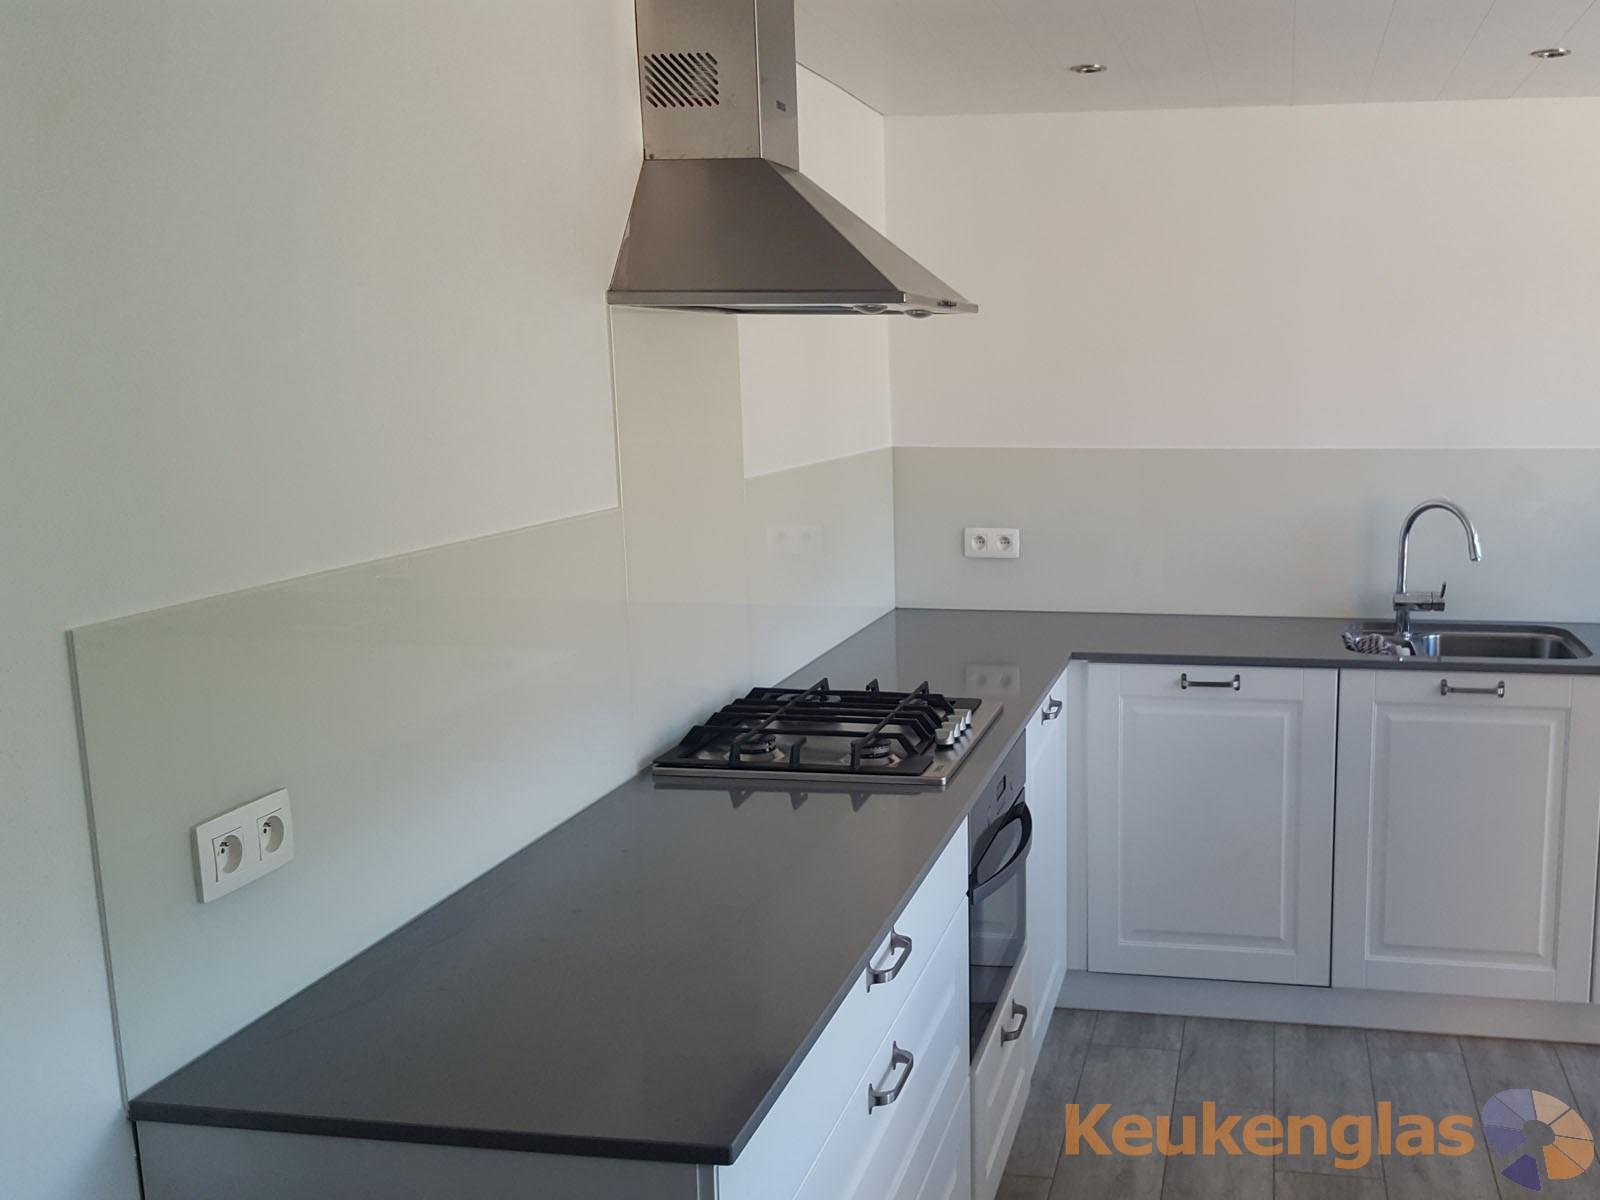 Glazen Achterwand Keuken Utrecht : Witte glazen keuken achterwand in Tongerlo (BE) Keukenglas